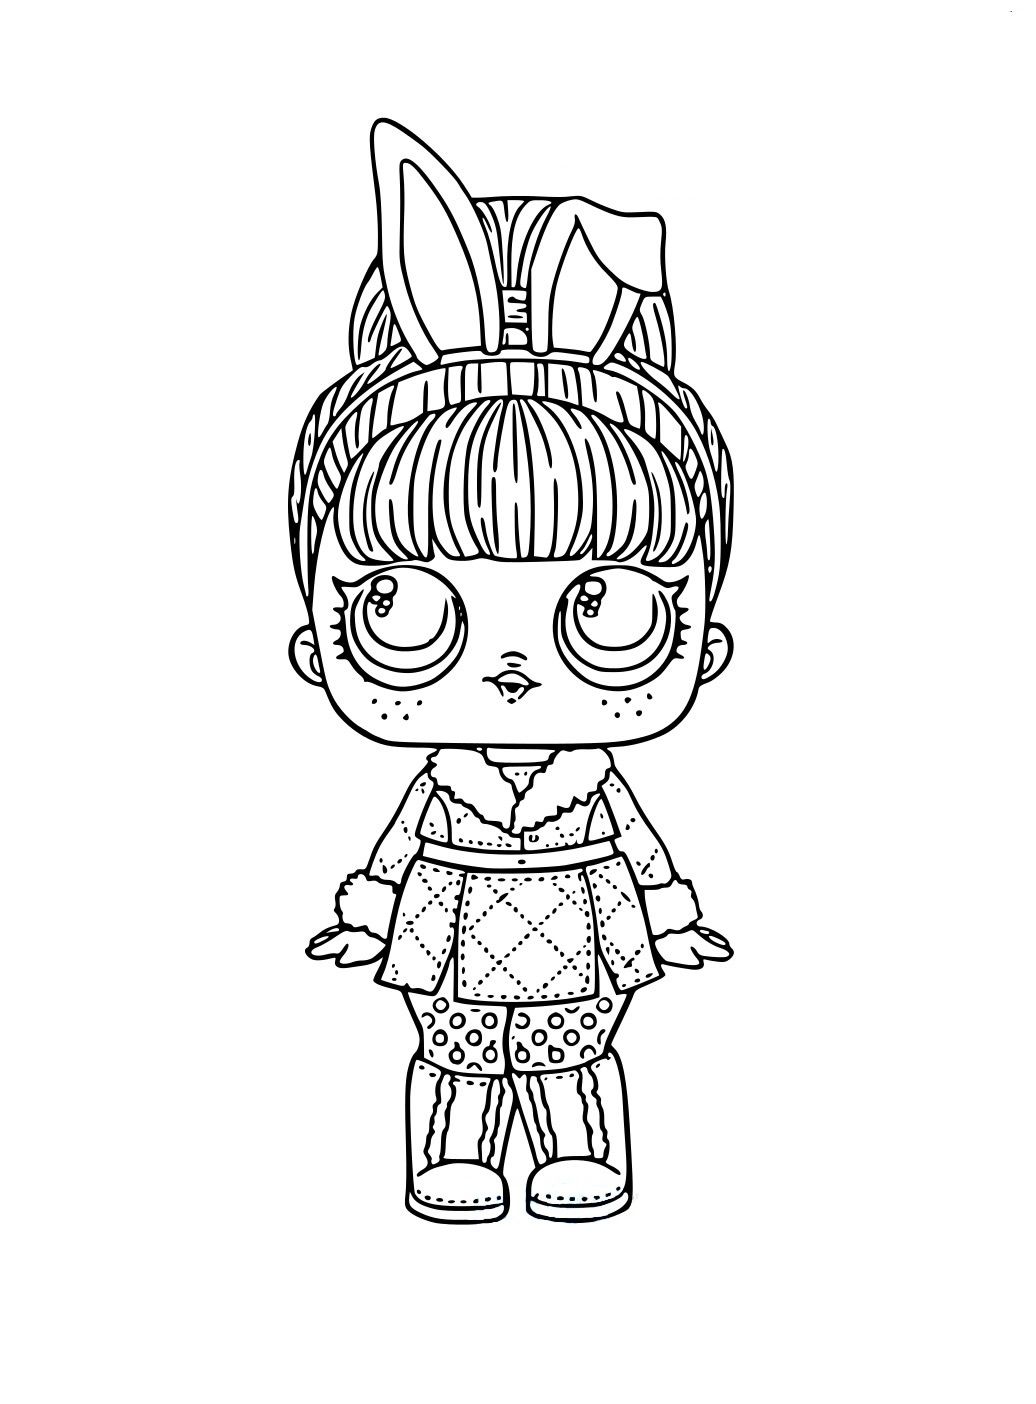 ЛОЛ Snow Bunny с волосами - Куклы LOL - Раскраски антистресс